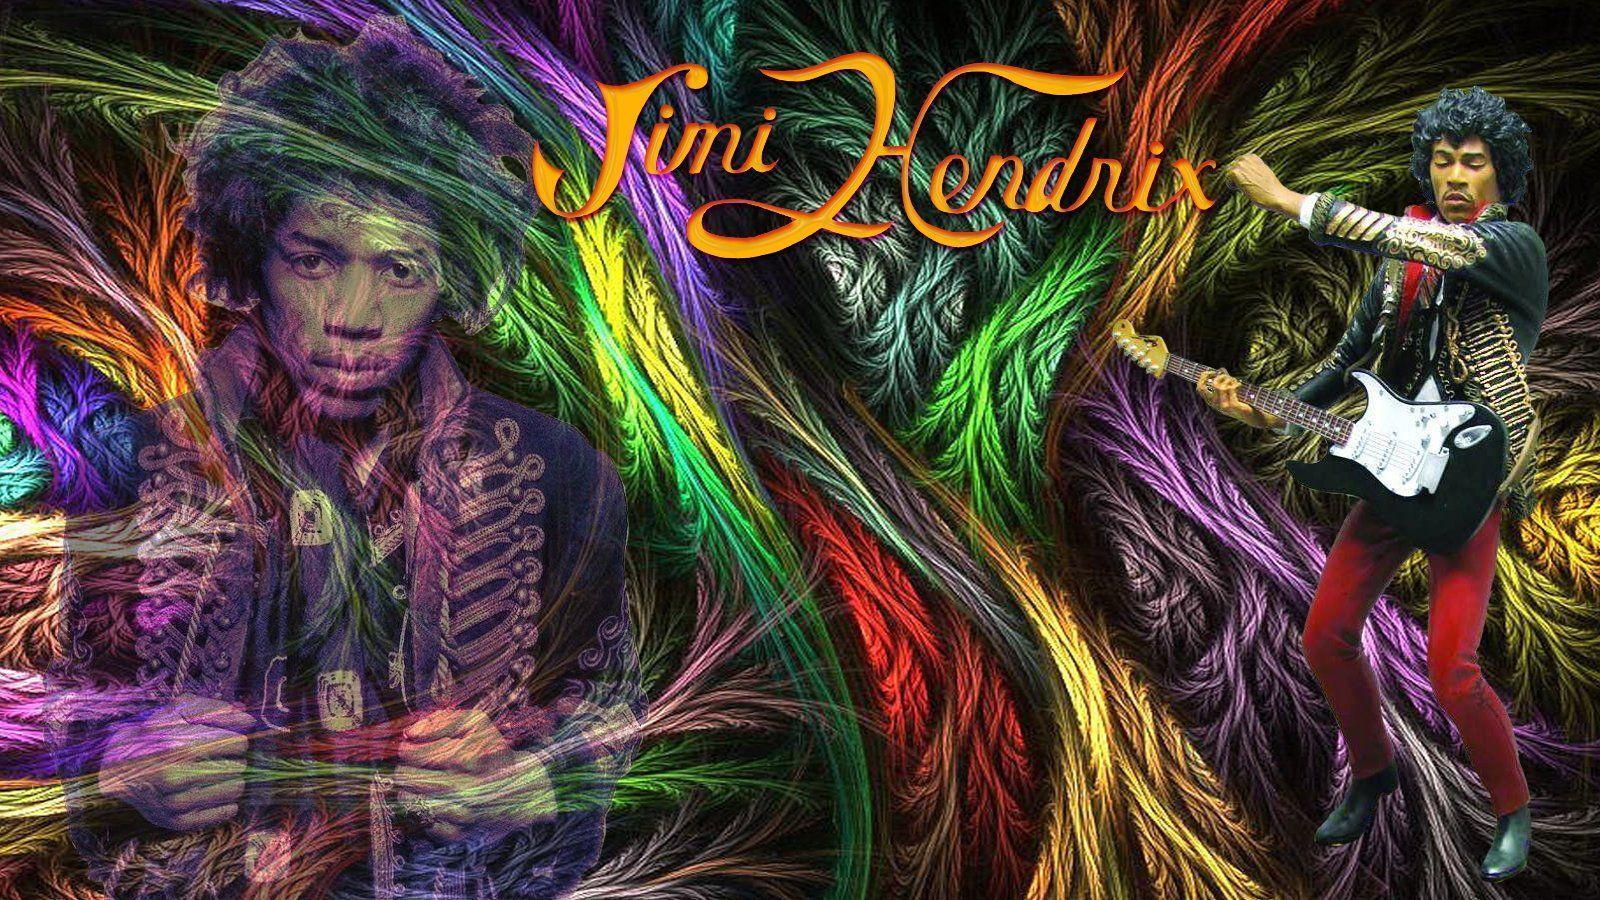 Jimmy Hendrix Wallpapers - Wallpaper Cave